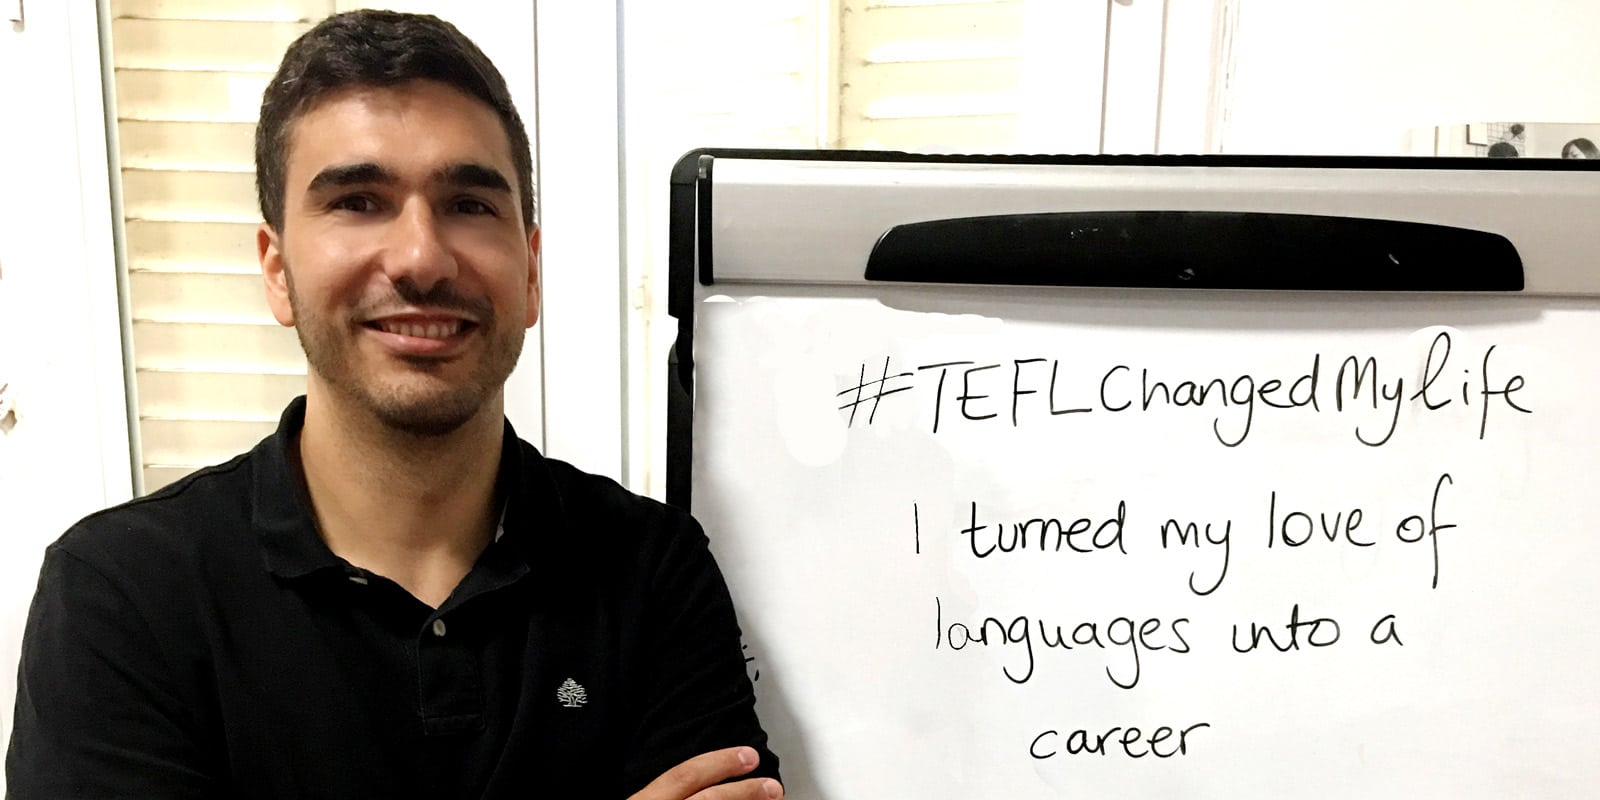 TEFL Changed my life- Hector